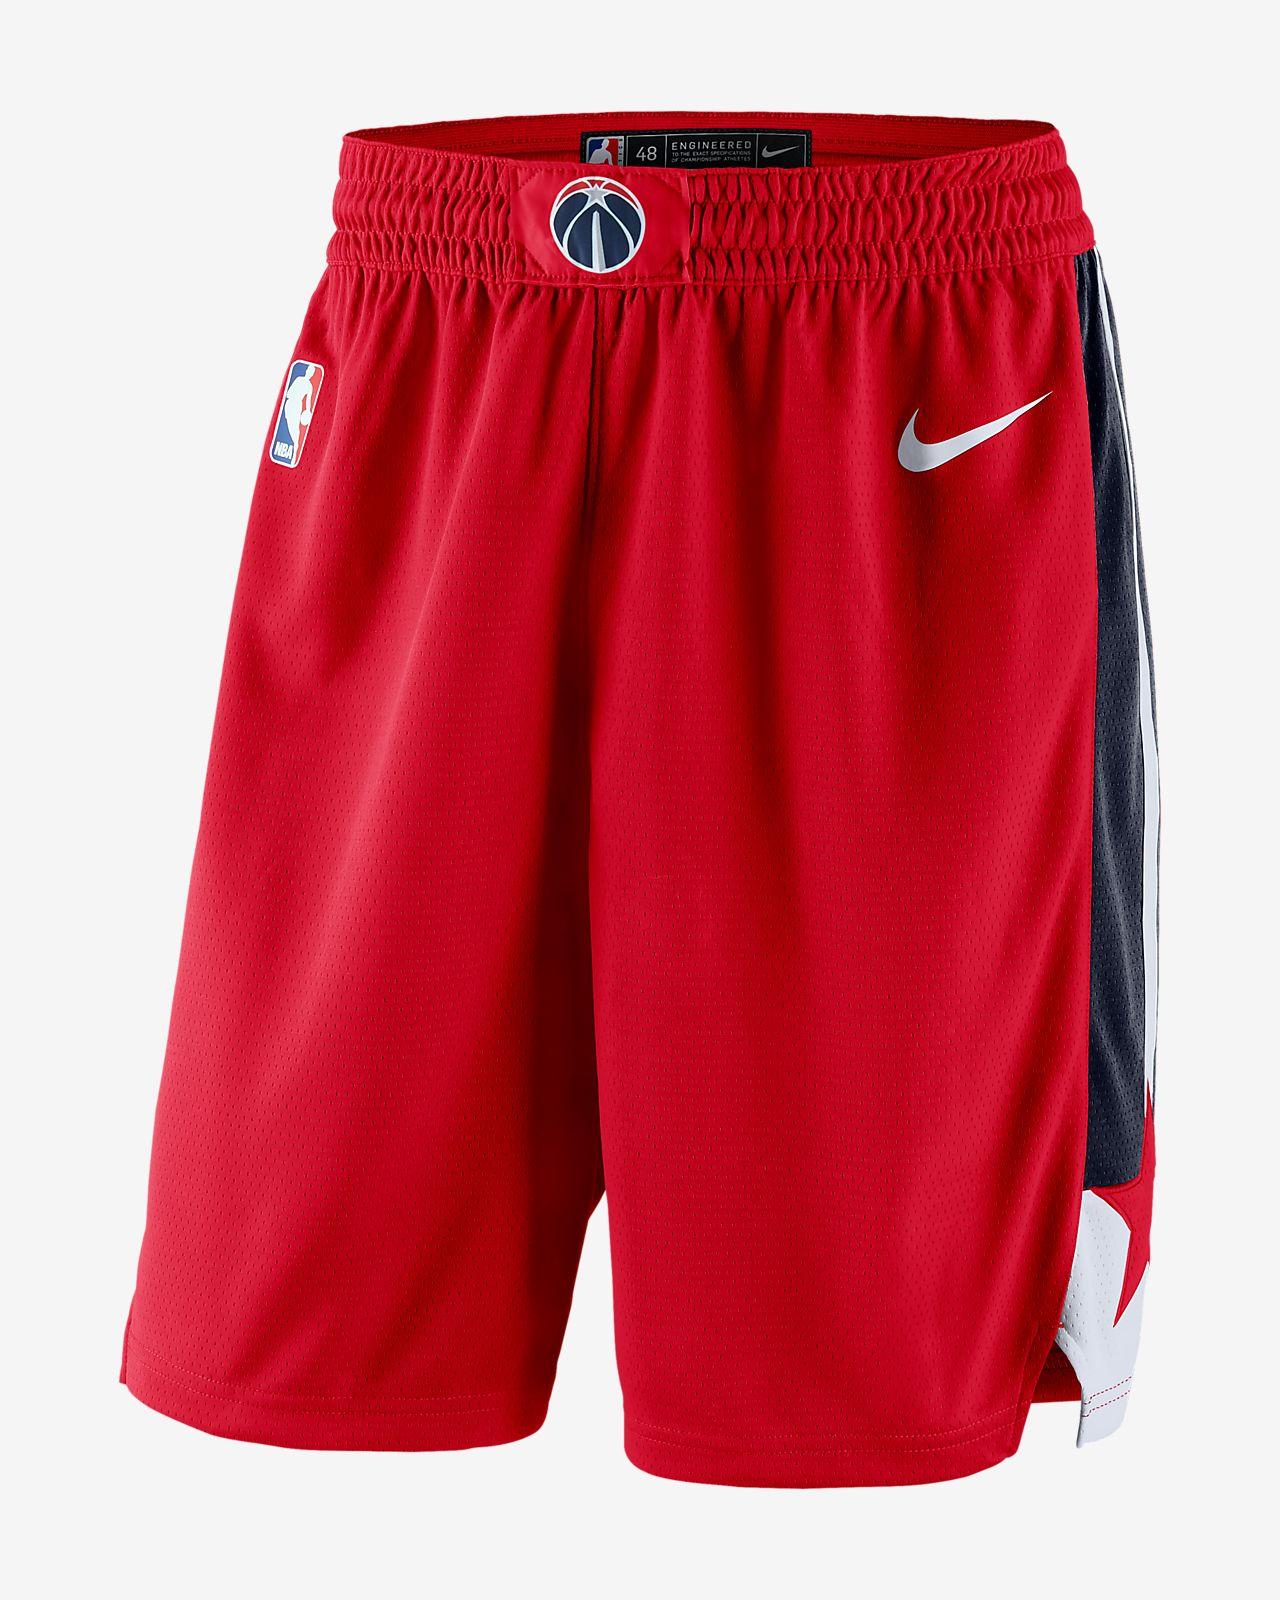 Washington Wizards Icon Edition Swingman Nike NBA-s férfi rövidnadrág